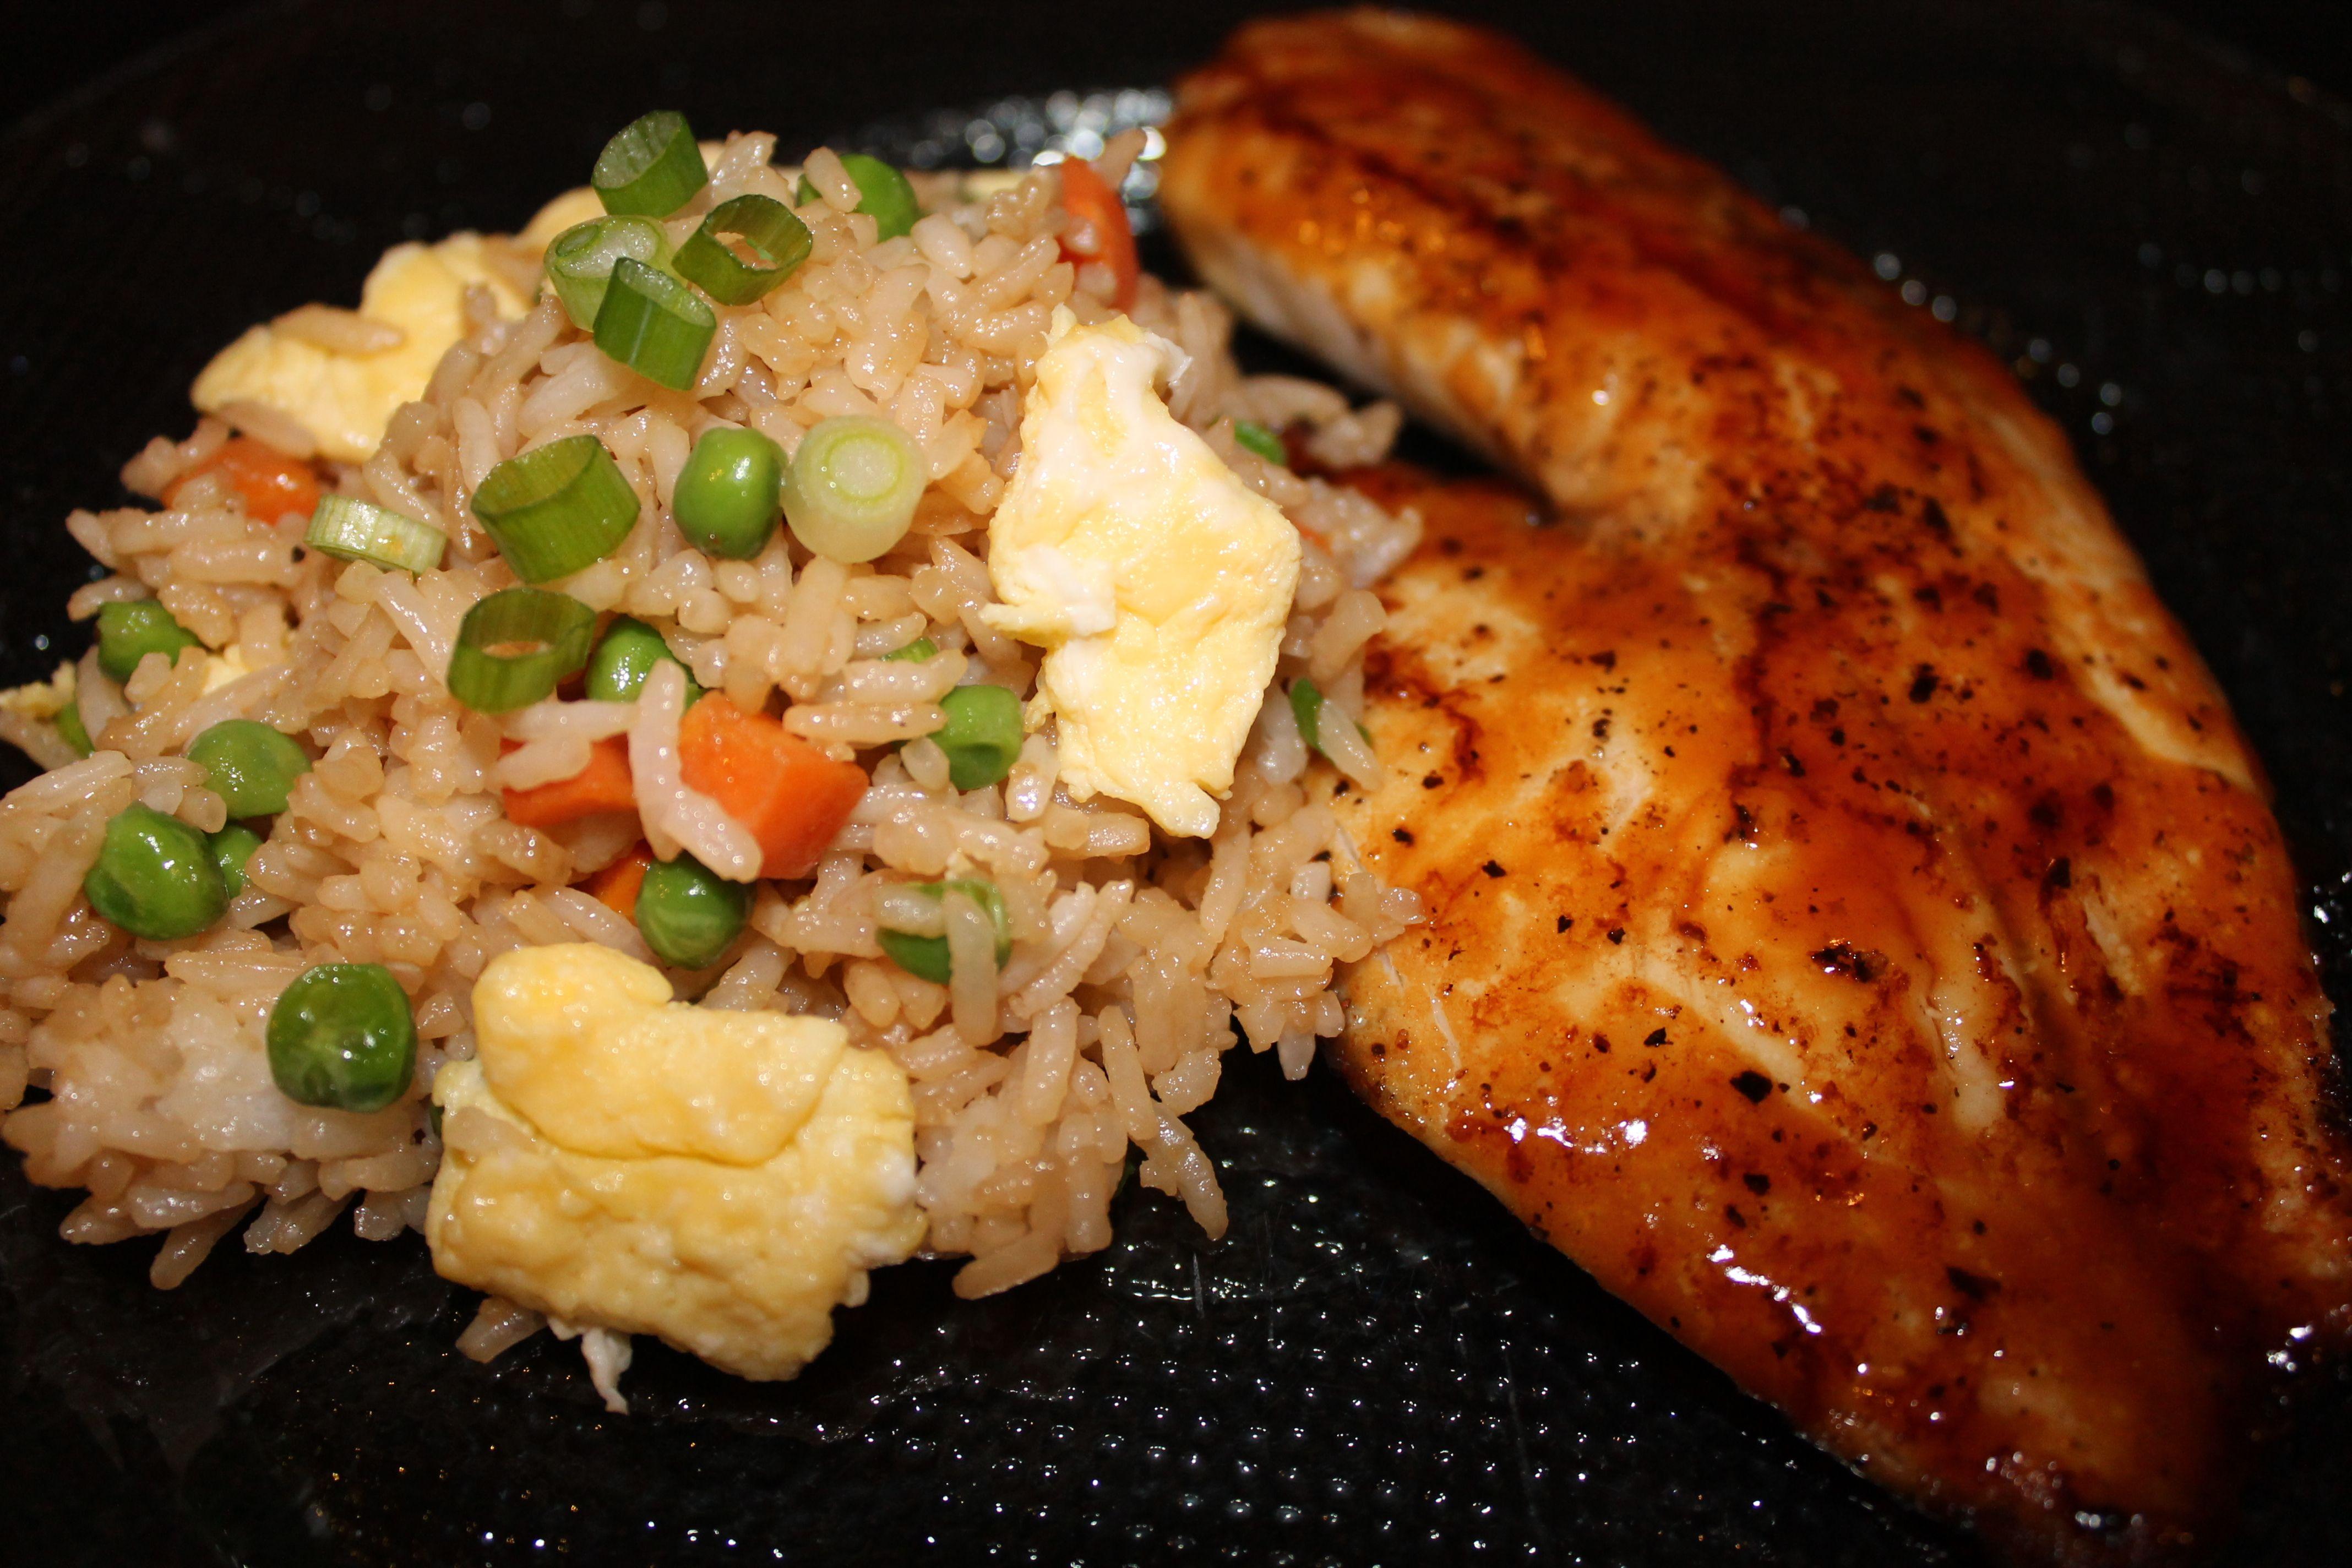 Vegetable Fried Rice And Teriyaki Glazed Tilapia Tilapia And Rice Recipe Tilapia Recipes Talapia Recipes